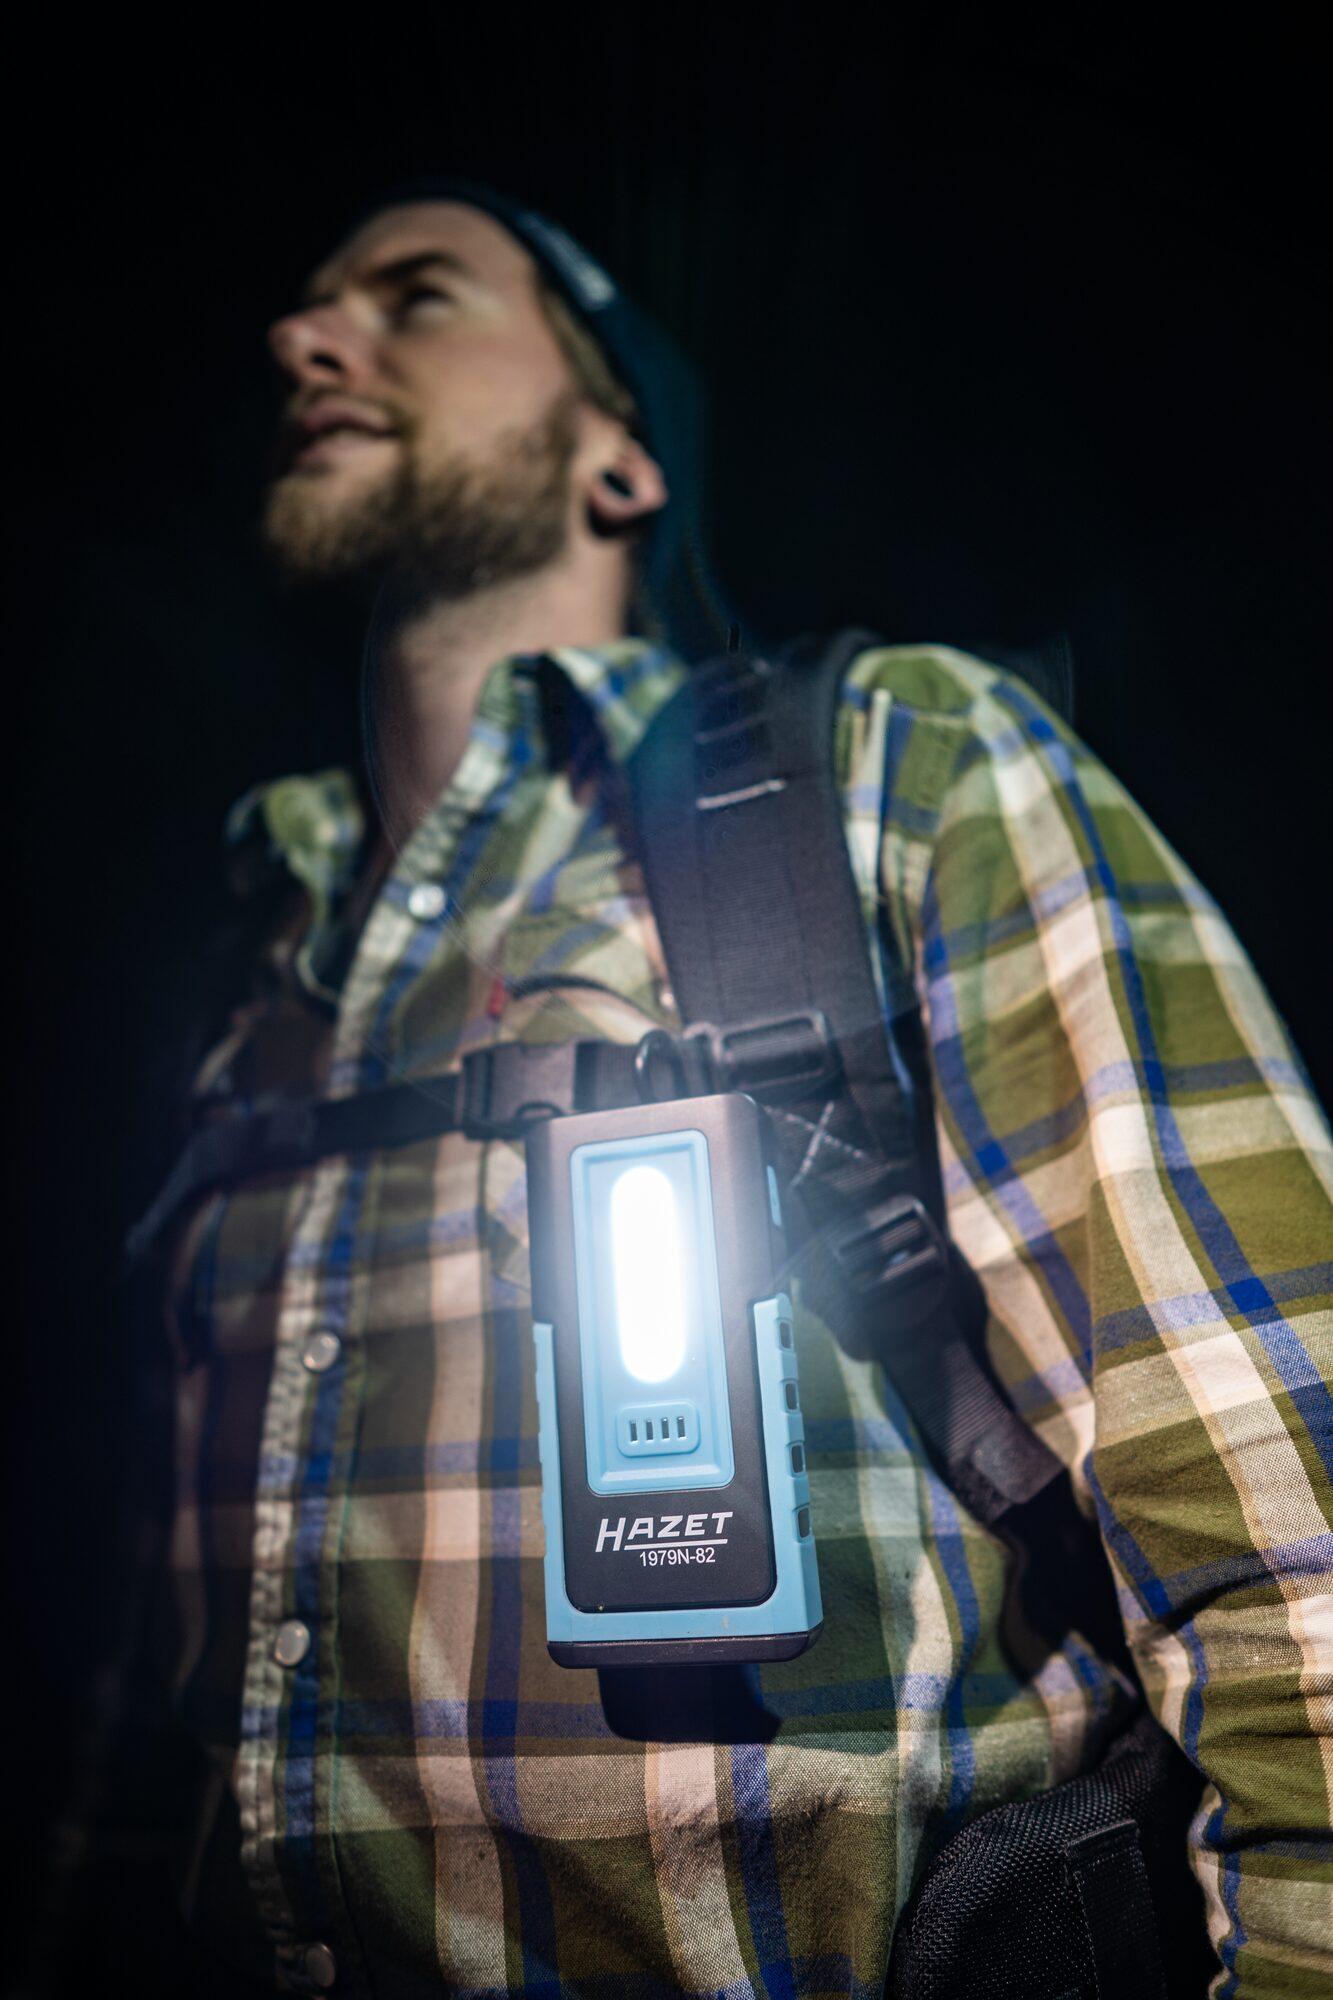 HAZET LED Pocket Light 1979N-82